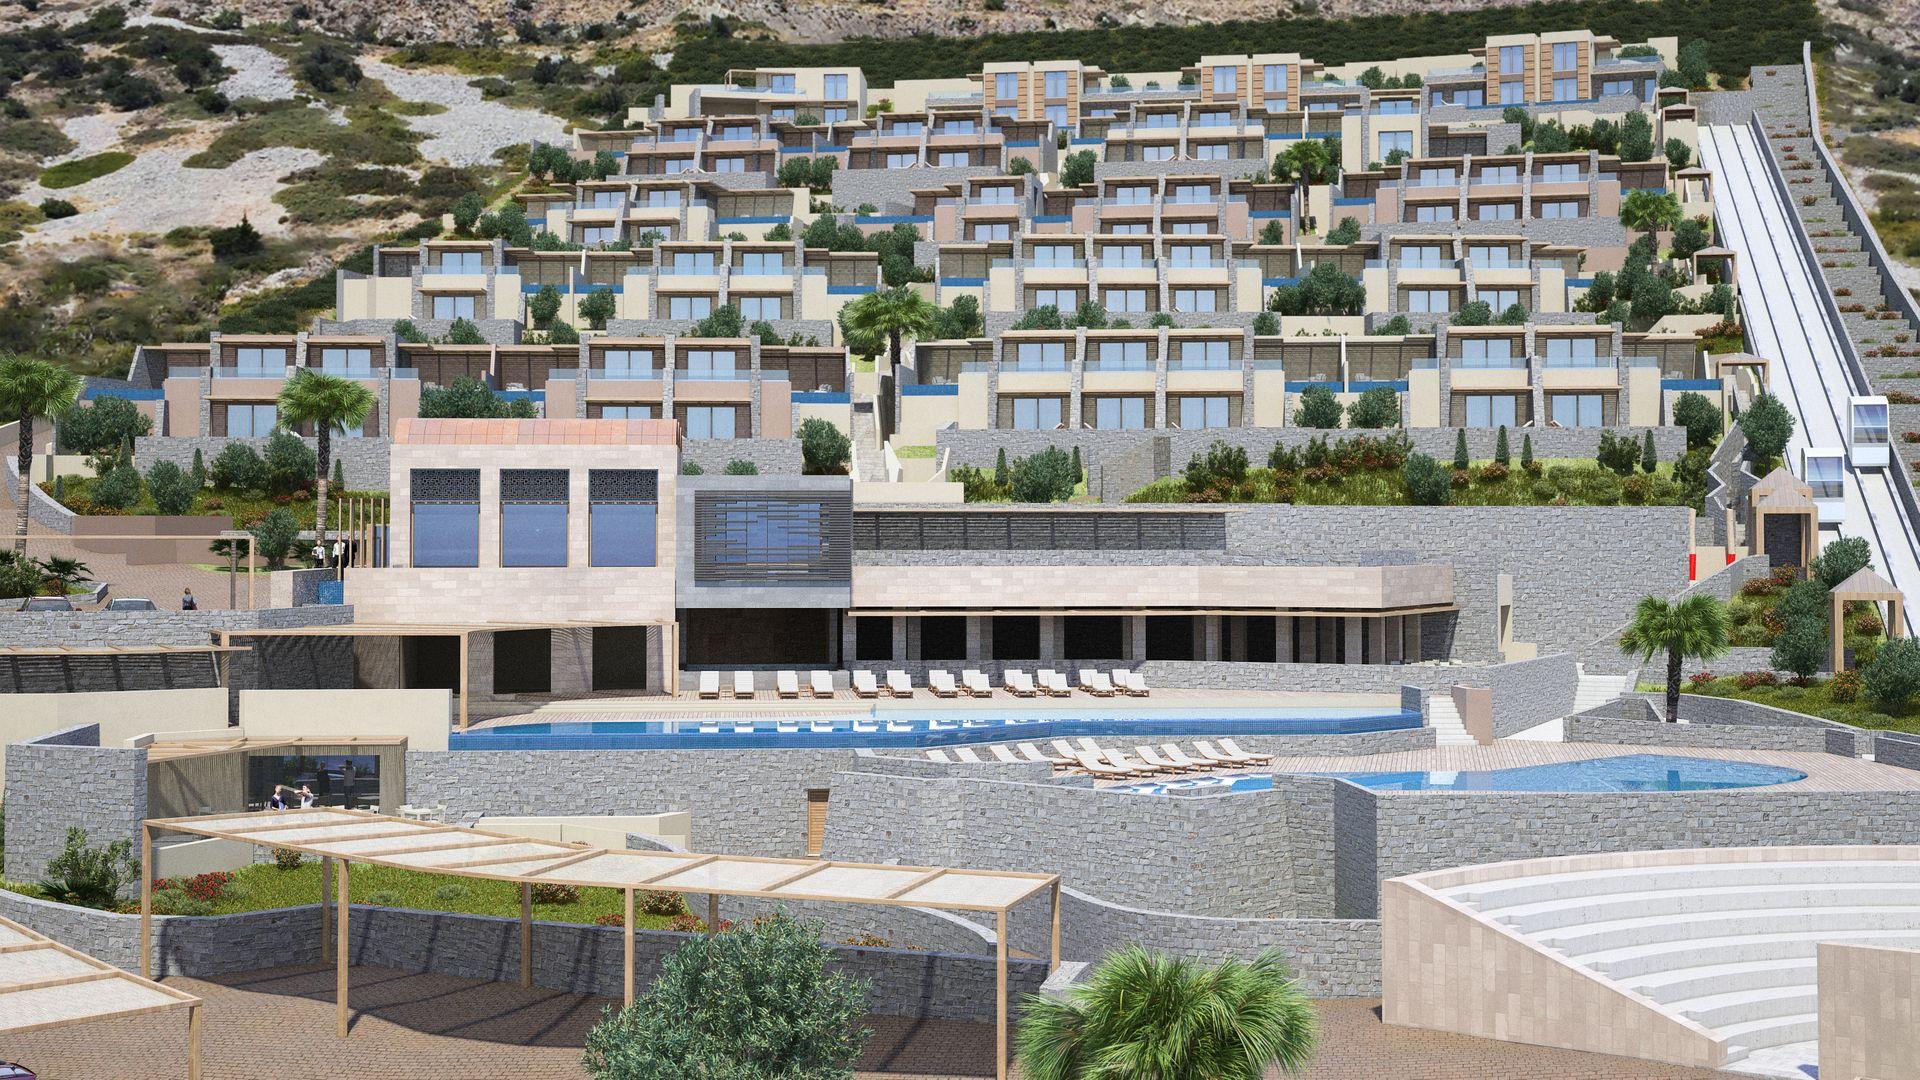 5* Cayo Exclusive Resort & Spa - Ελούντα, Κρήτη